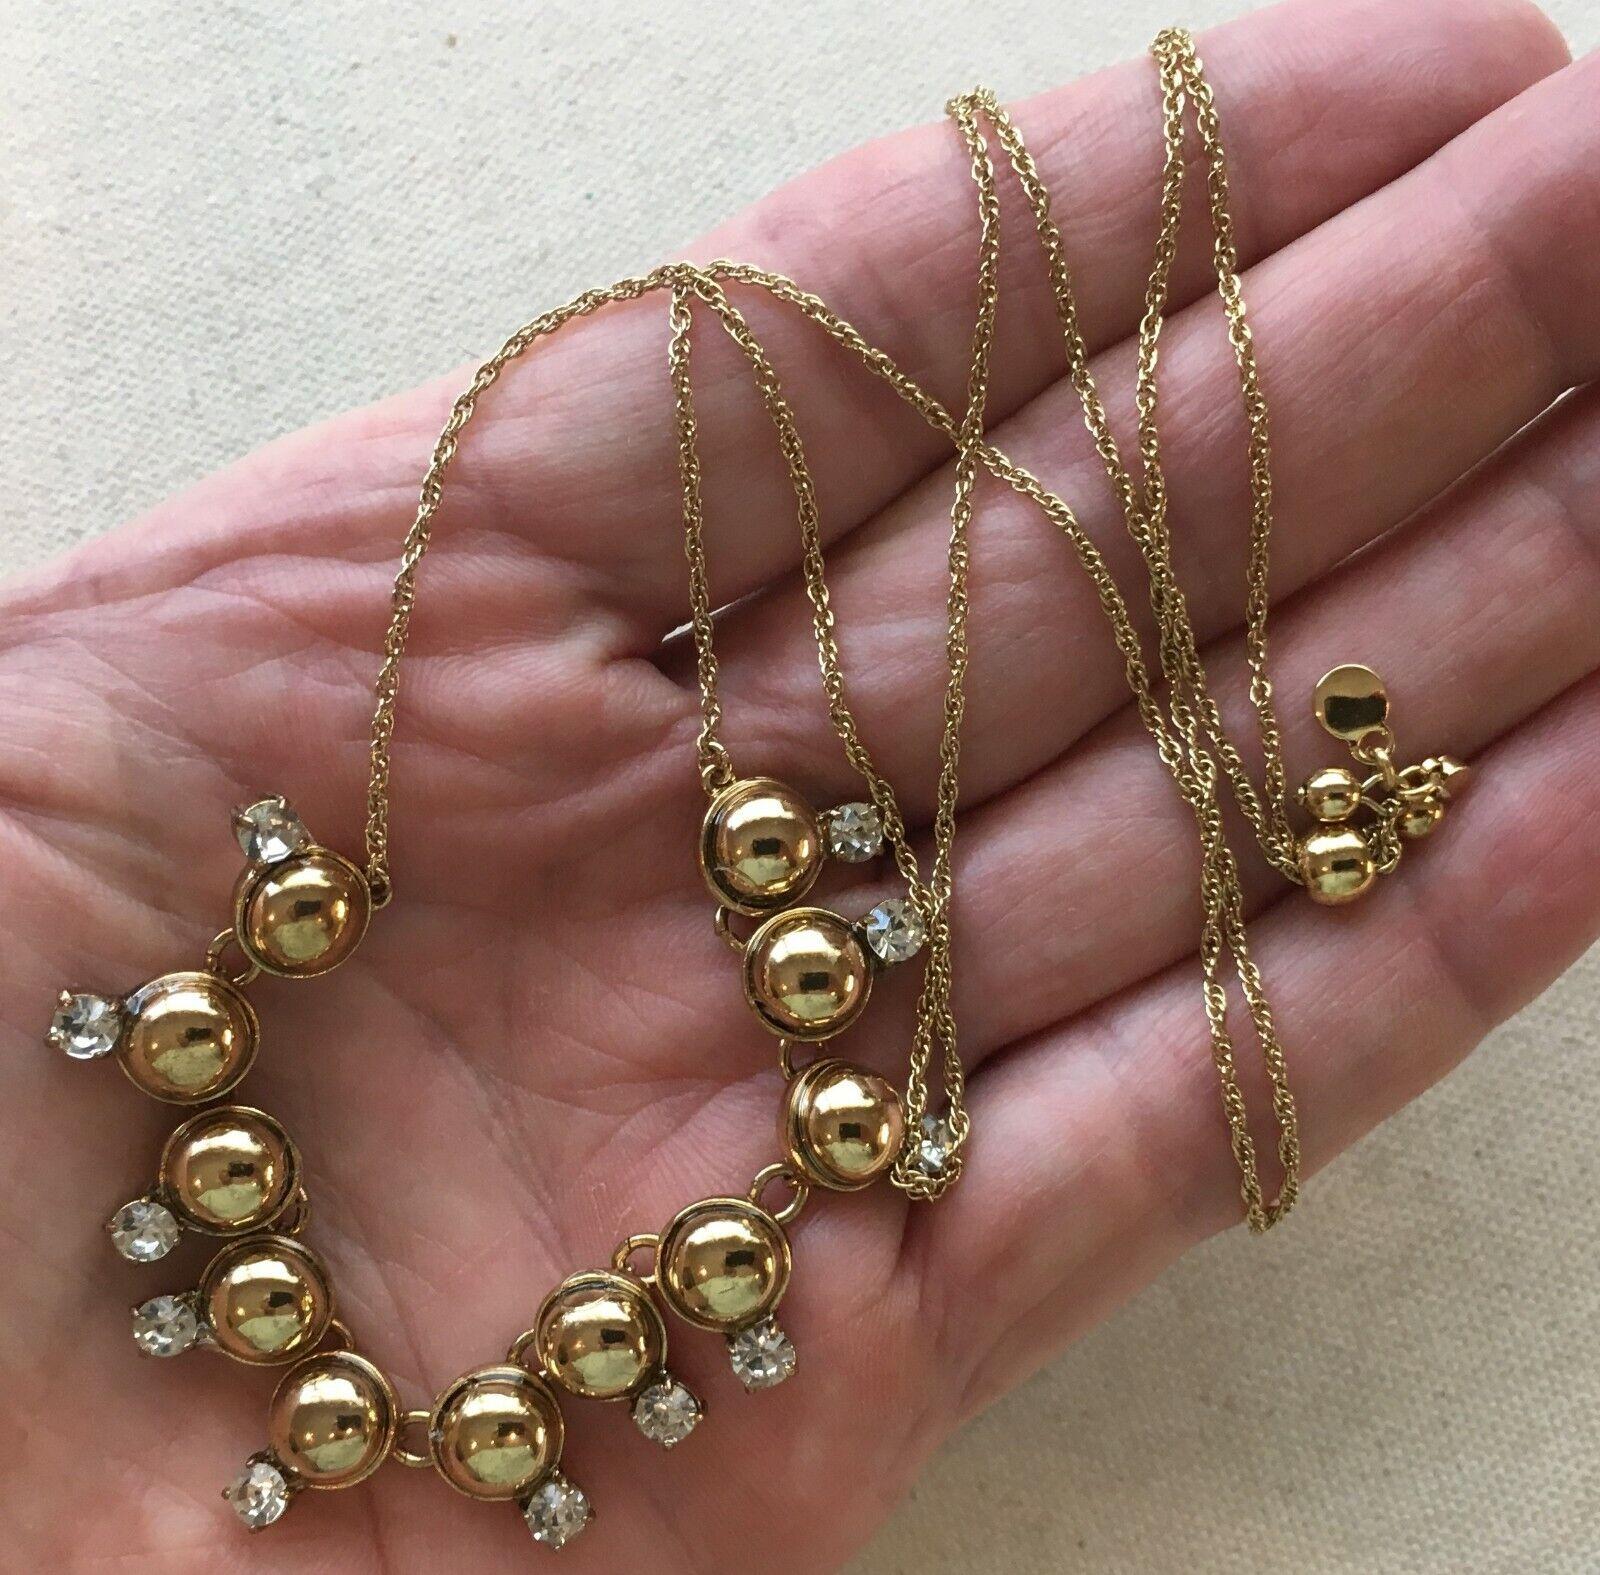 Ann Taylor Choker Necklace Rhinestone Caviar Bubbles Gold-Tone Steampunk 14-26